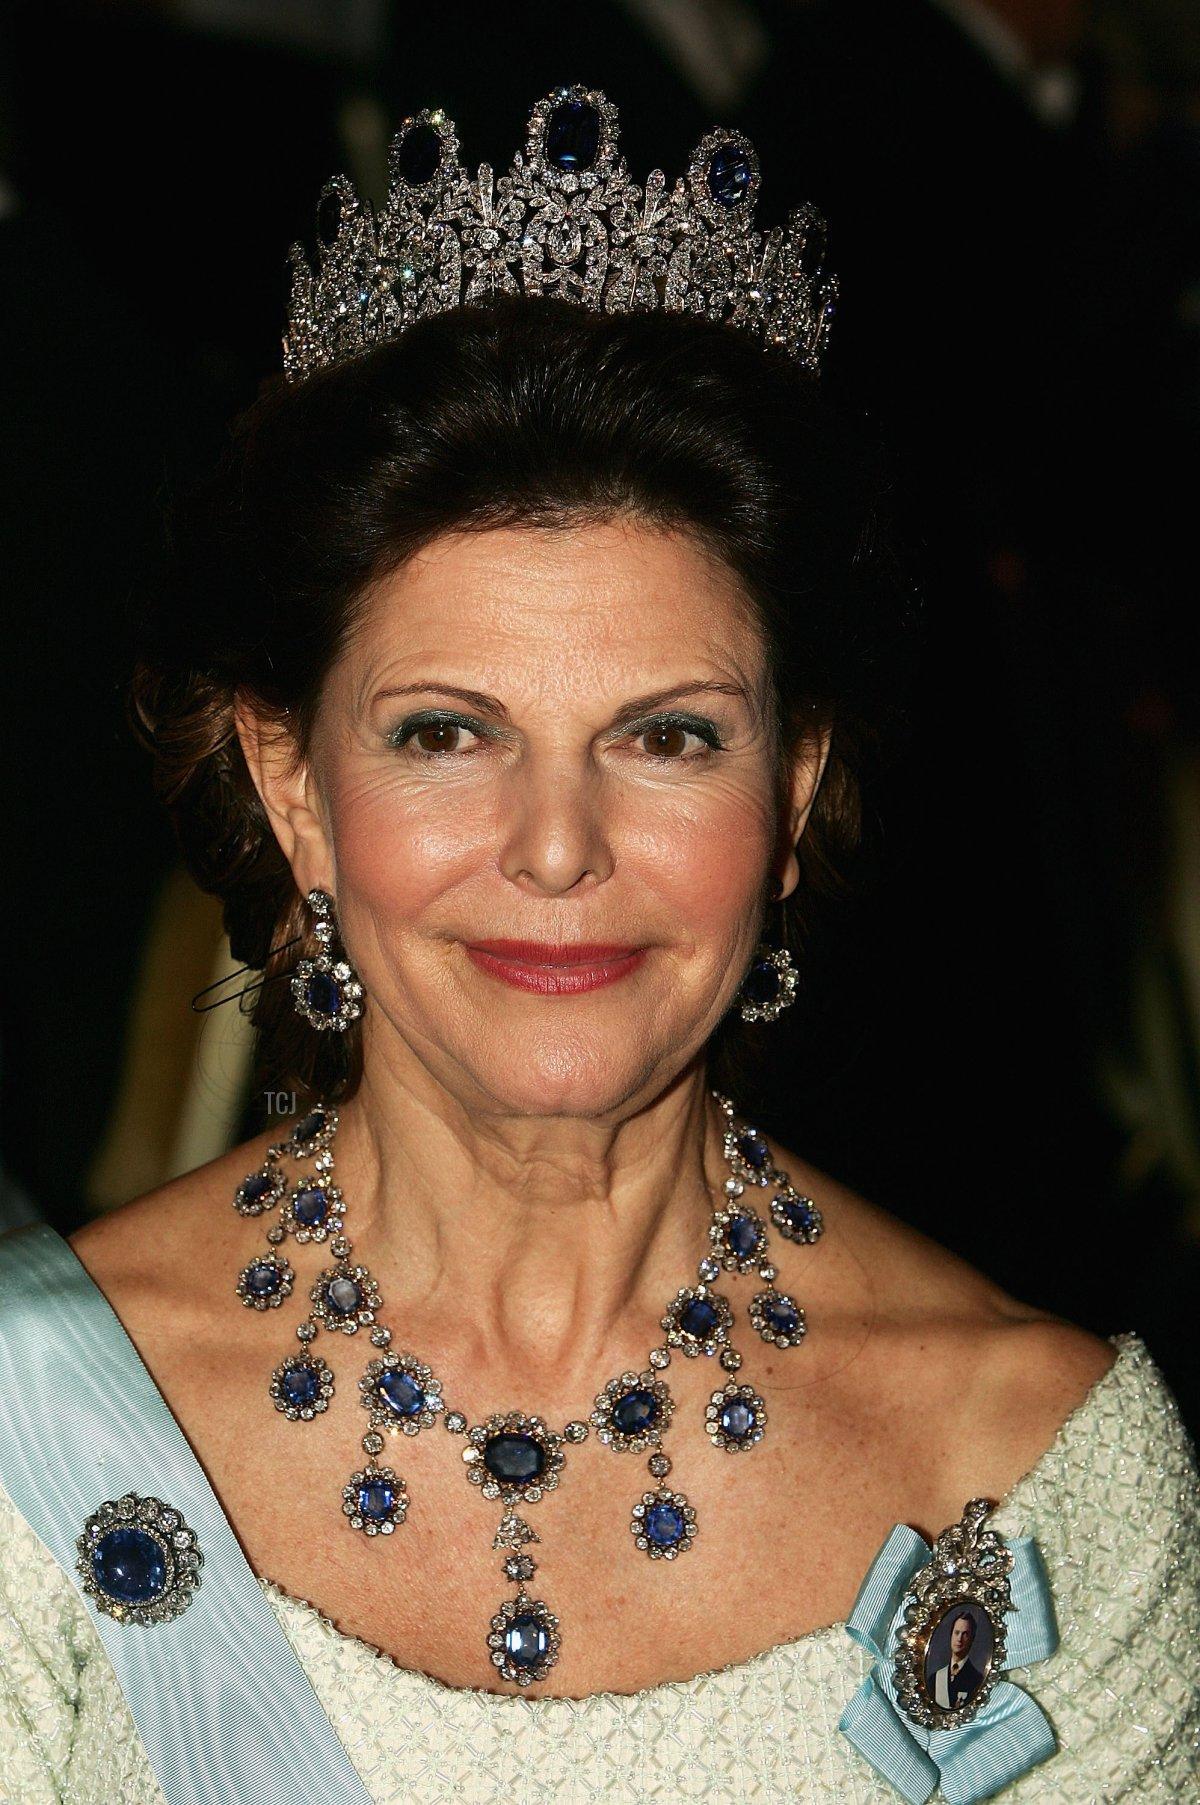 Queen Silvia of Sweden attends the Nobel Banquet at City Hall on December 10, 2004 in Stockholm, Sweden